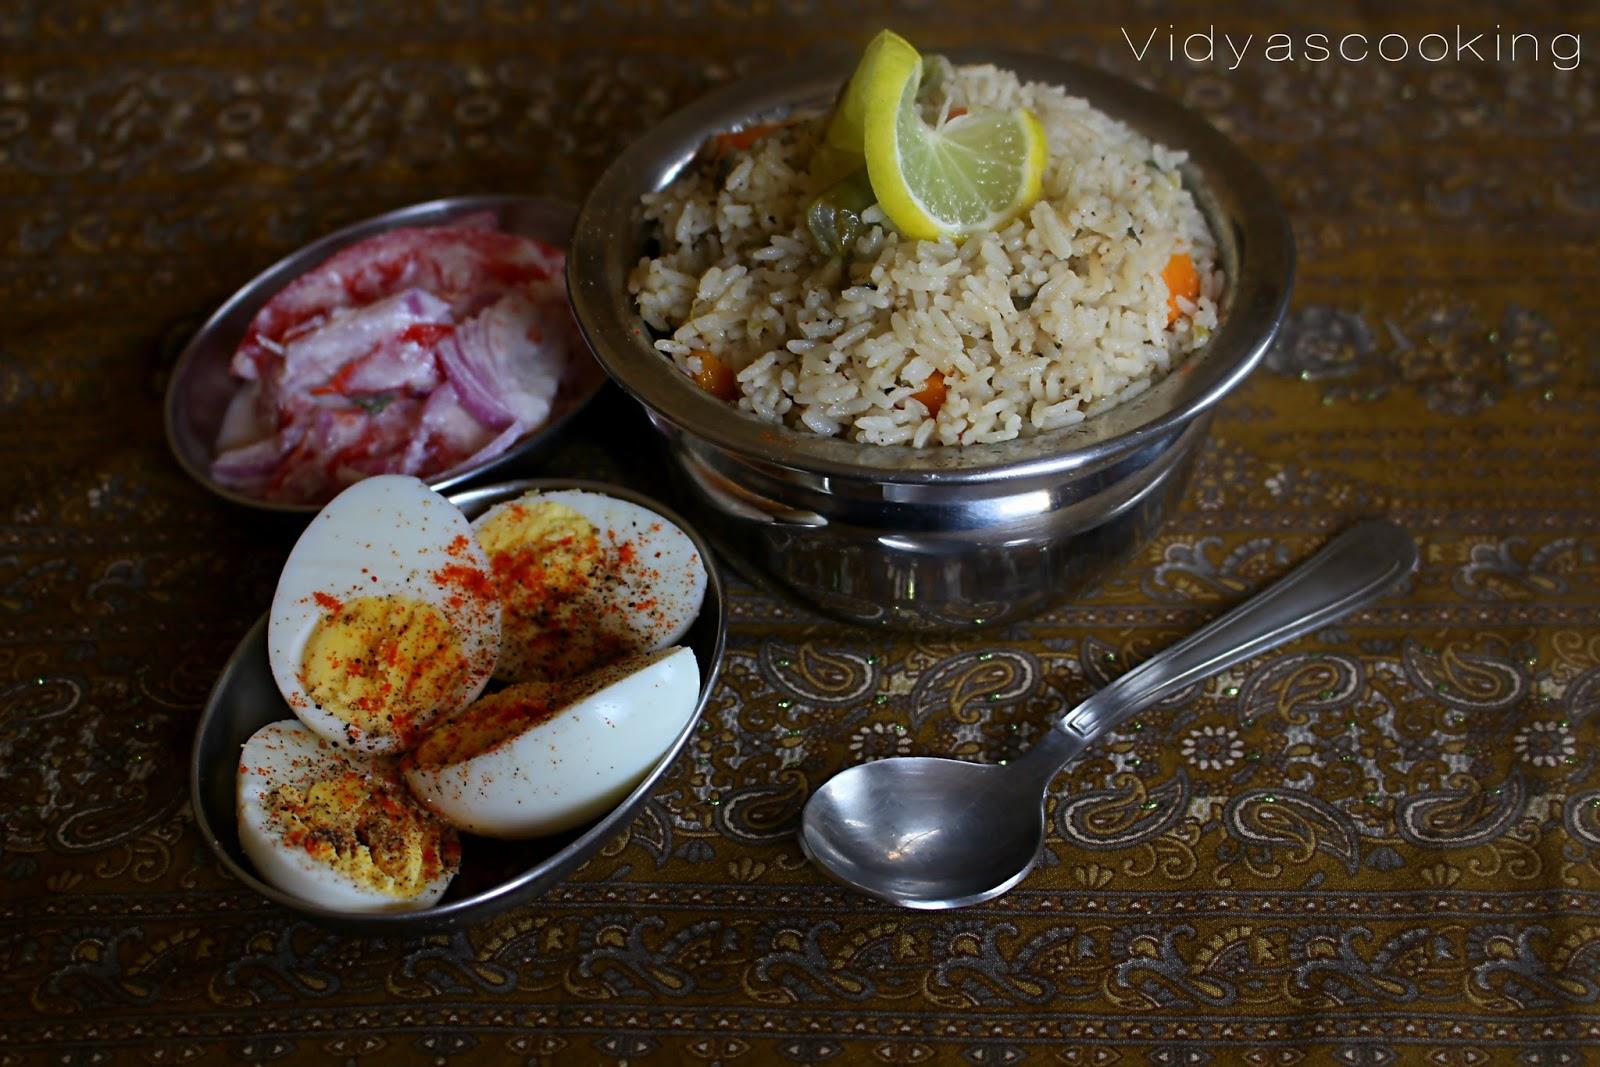 Vidyascooking karnataka style vegetable pulao recipe karnataka style vegetable pulao recipe forumfinder Choice Image